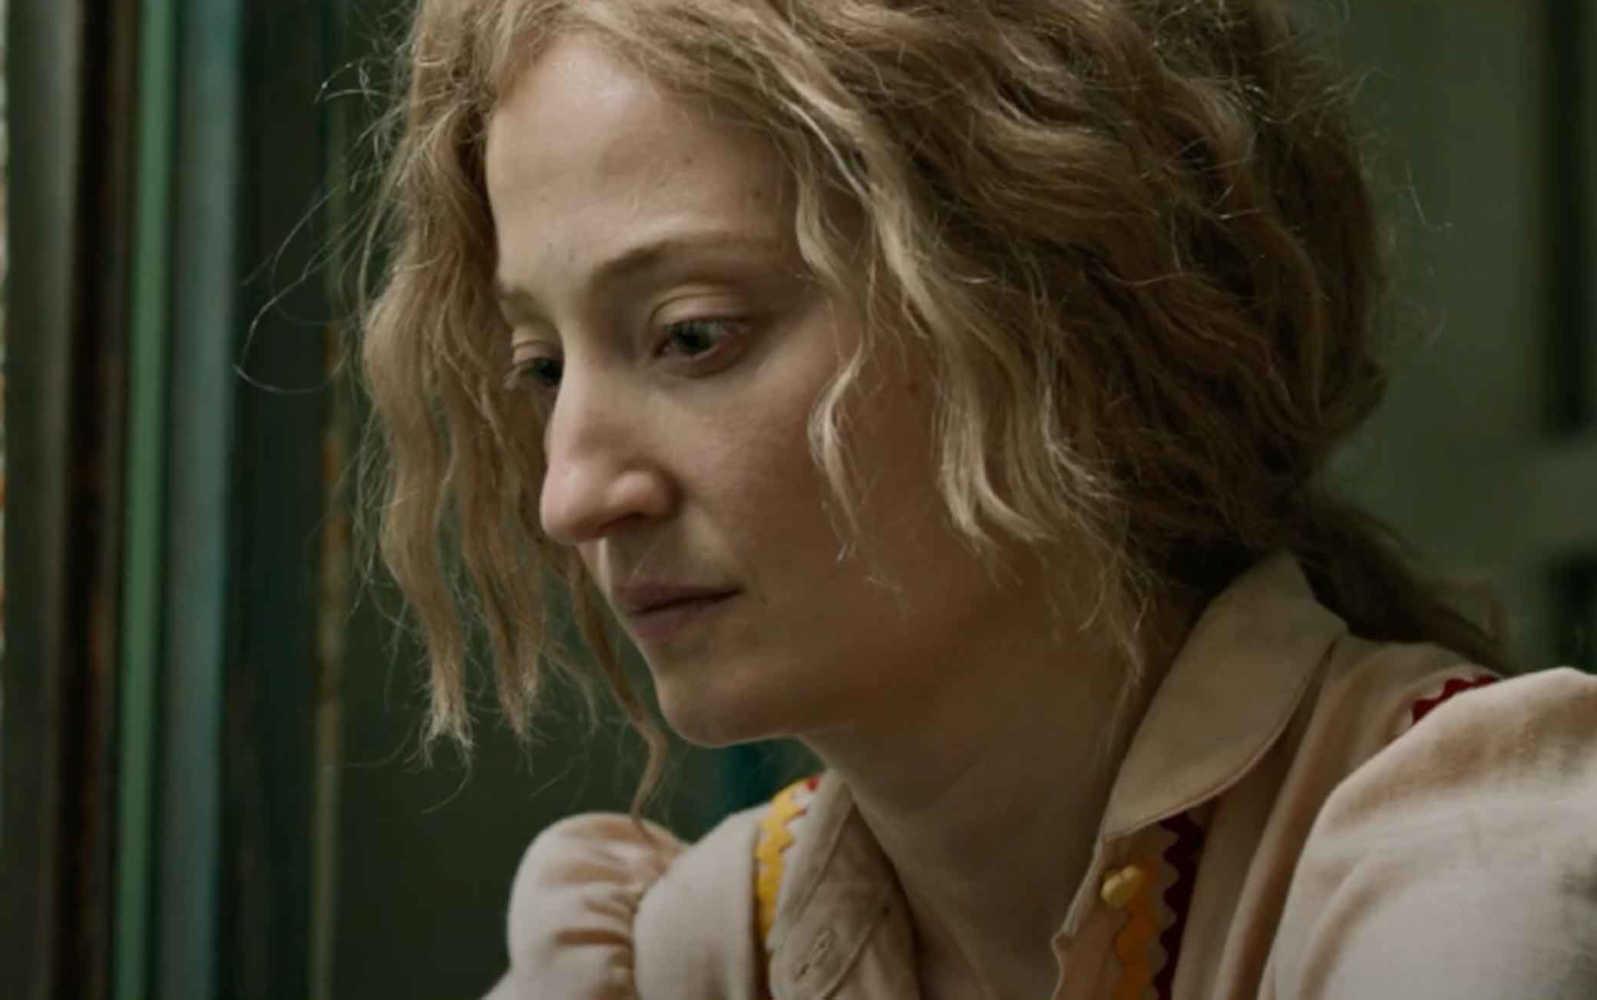 Lacci (Laces) the new film by Daniele Luchetti from 15 July in theater Tuttoitalia